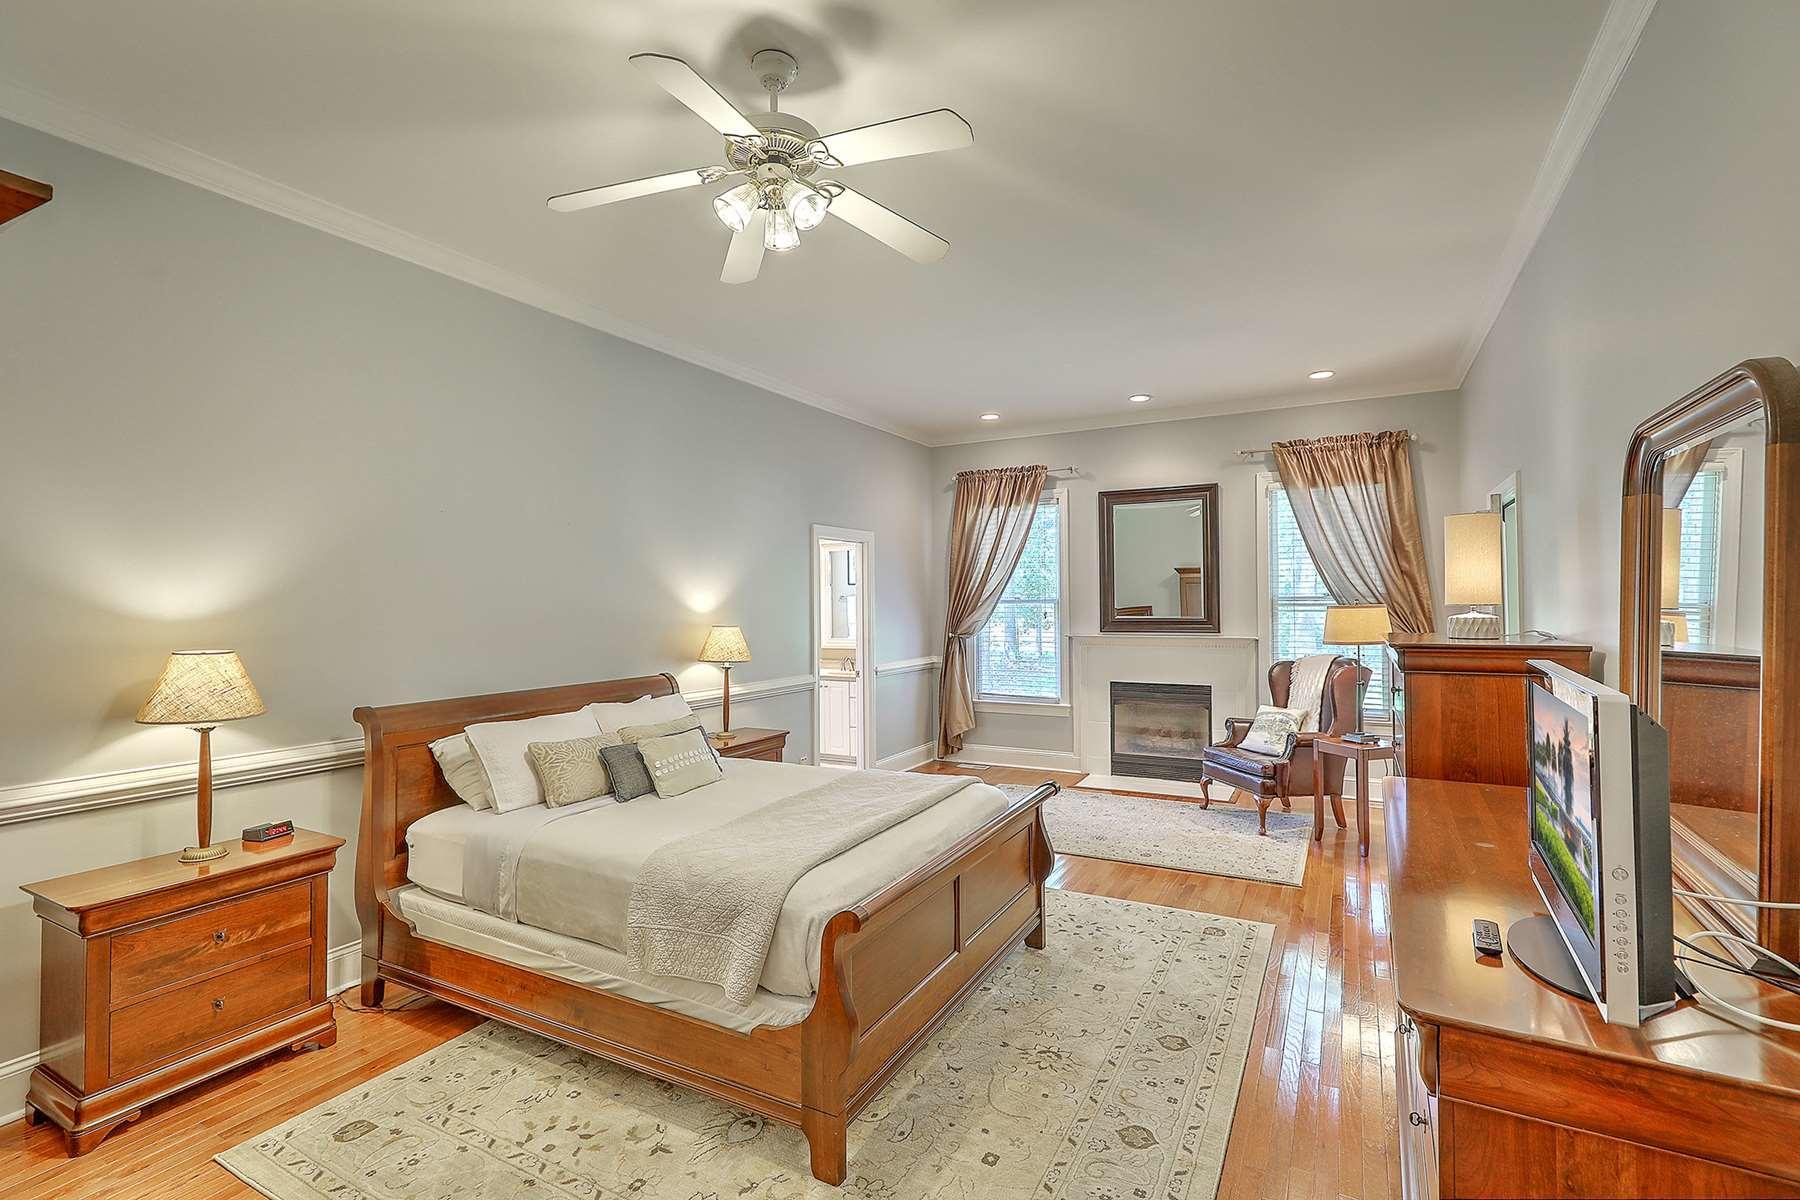 Dunes West Homes For Sale - 2961 Pignatelli, Mount Pleasant, SC - 11